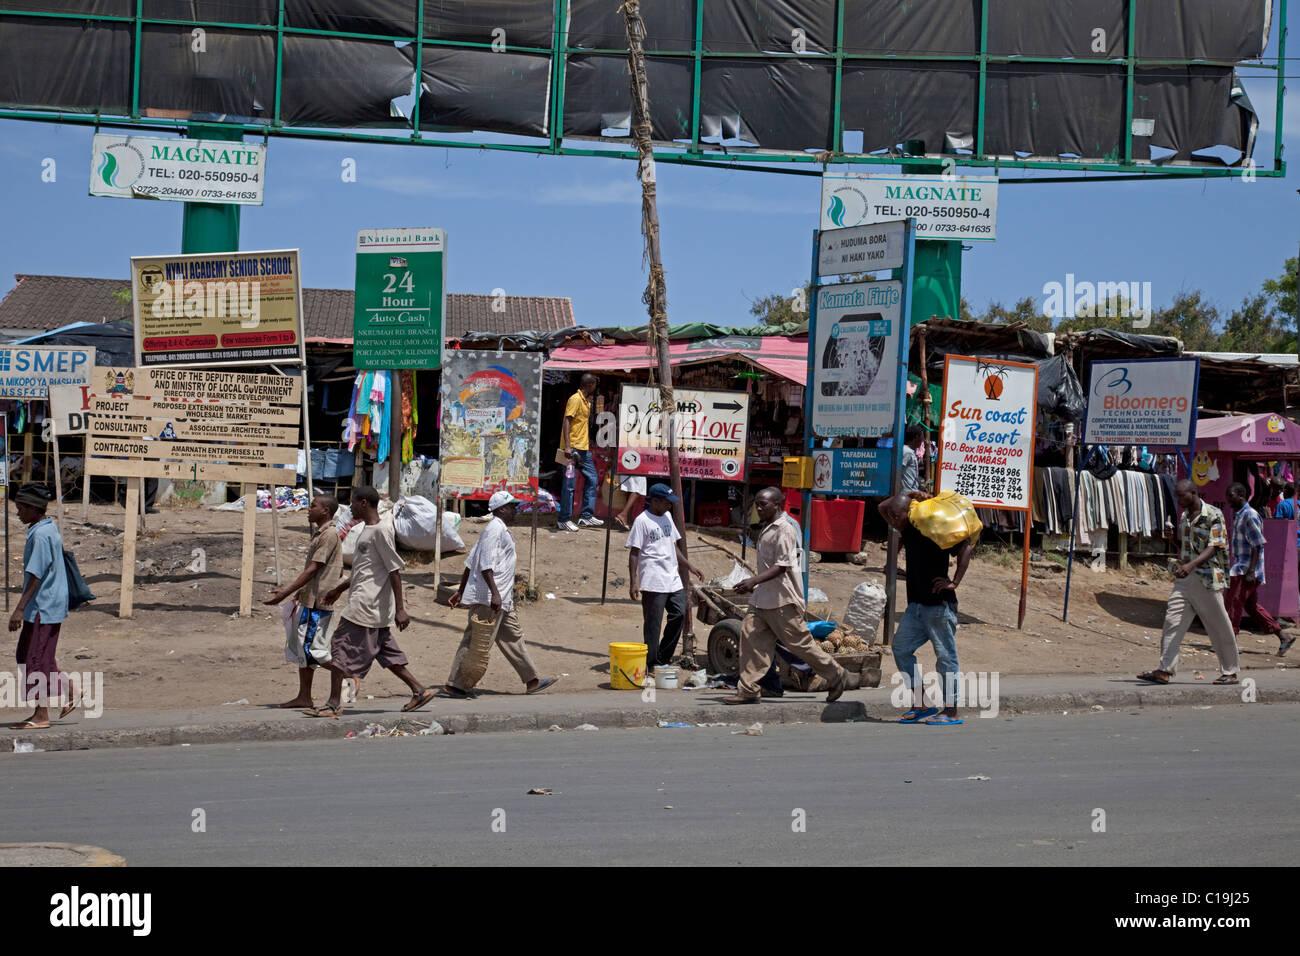 Africans walking past advertising bill boards hoardings in casual street scene Mombasa Kenya - Stock Image